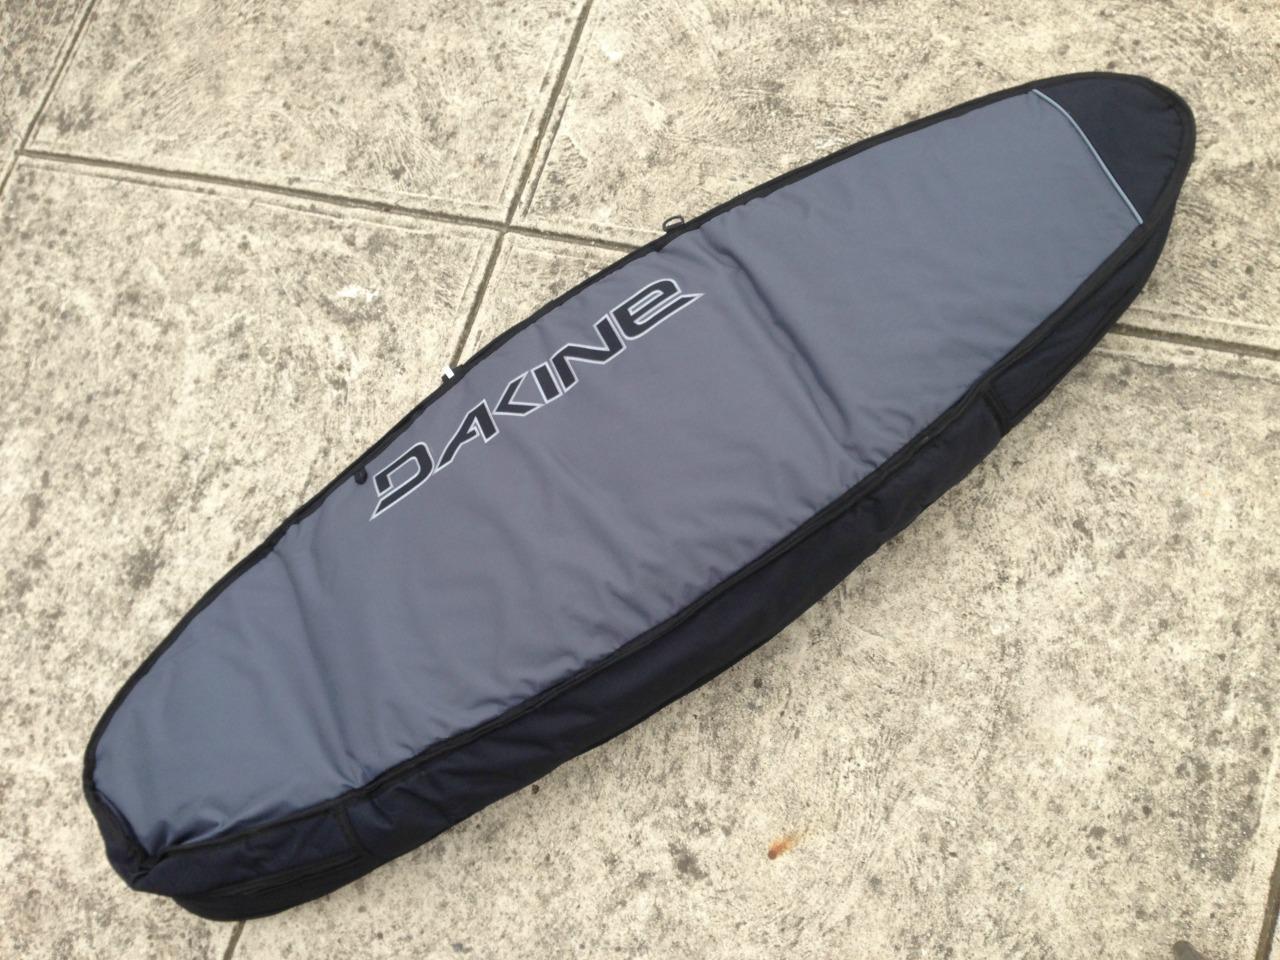 Dakine Regulator Recon Triple Surfboard Travel Bag